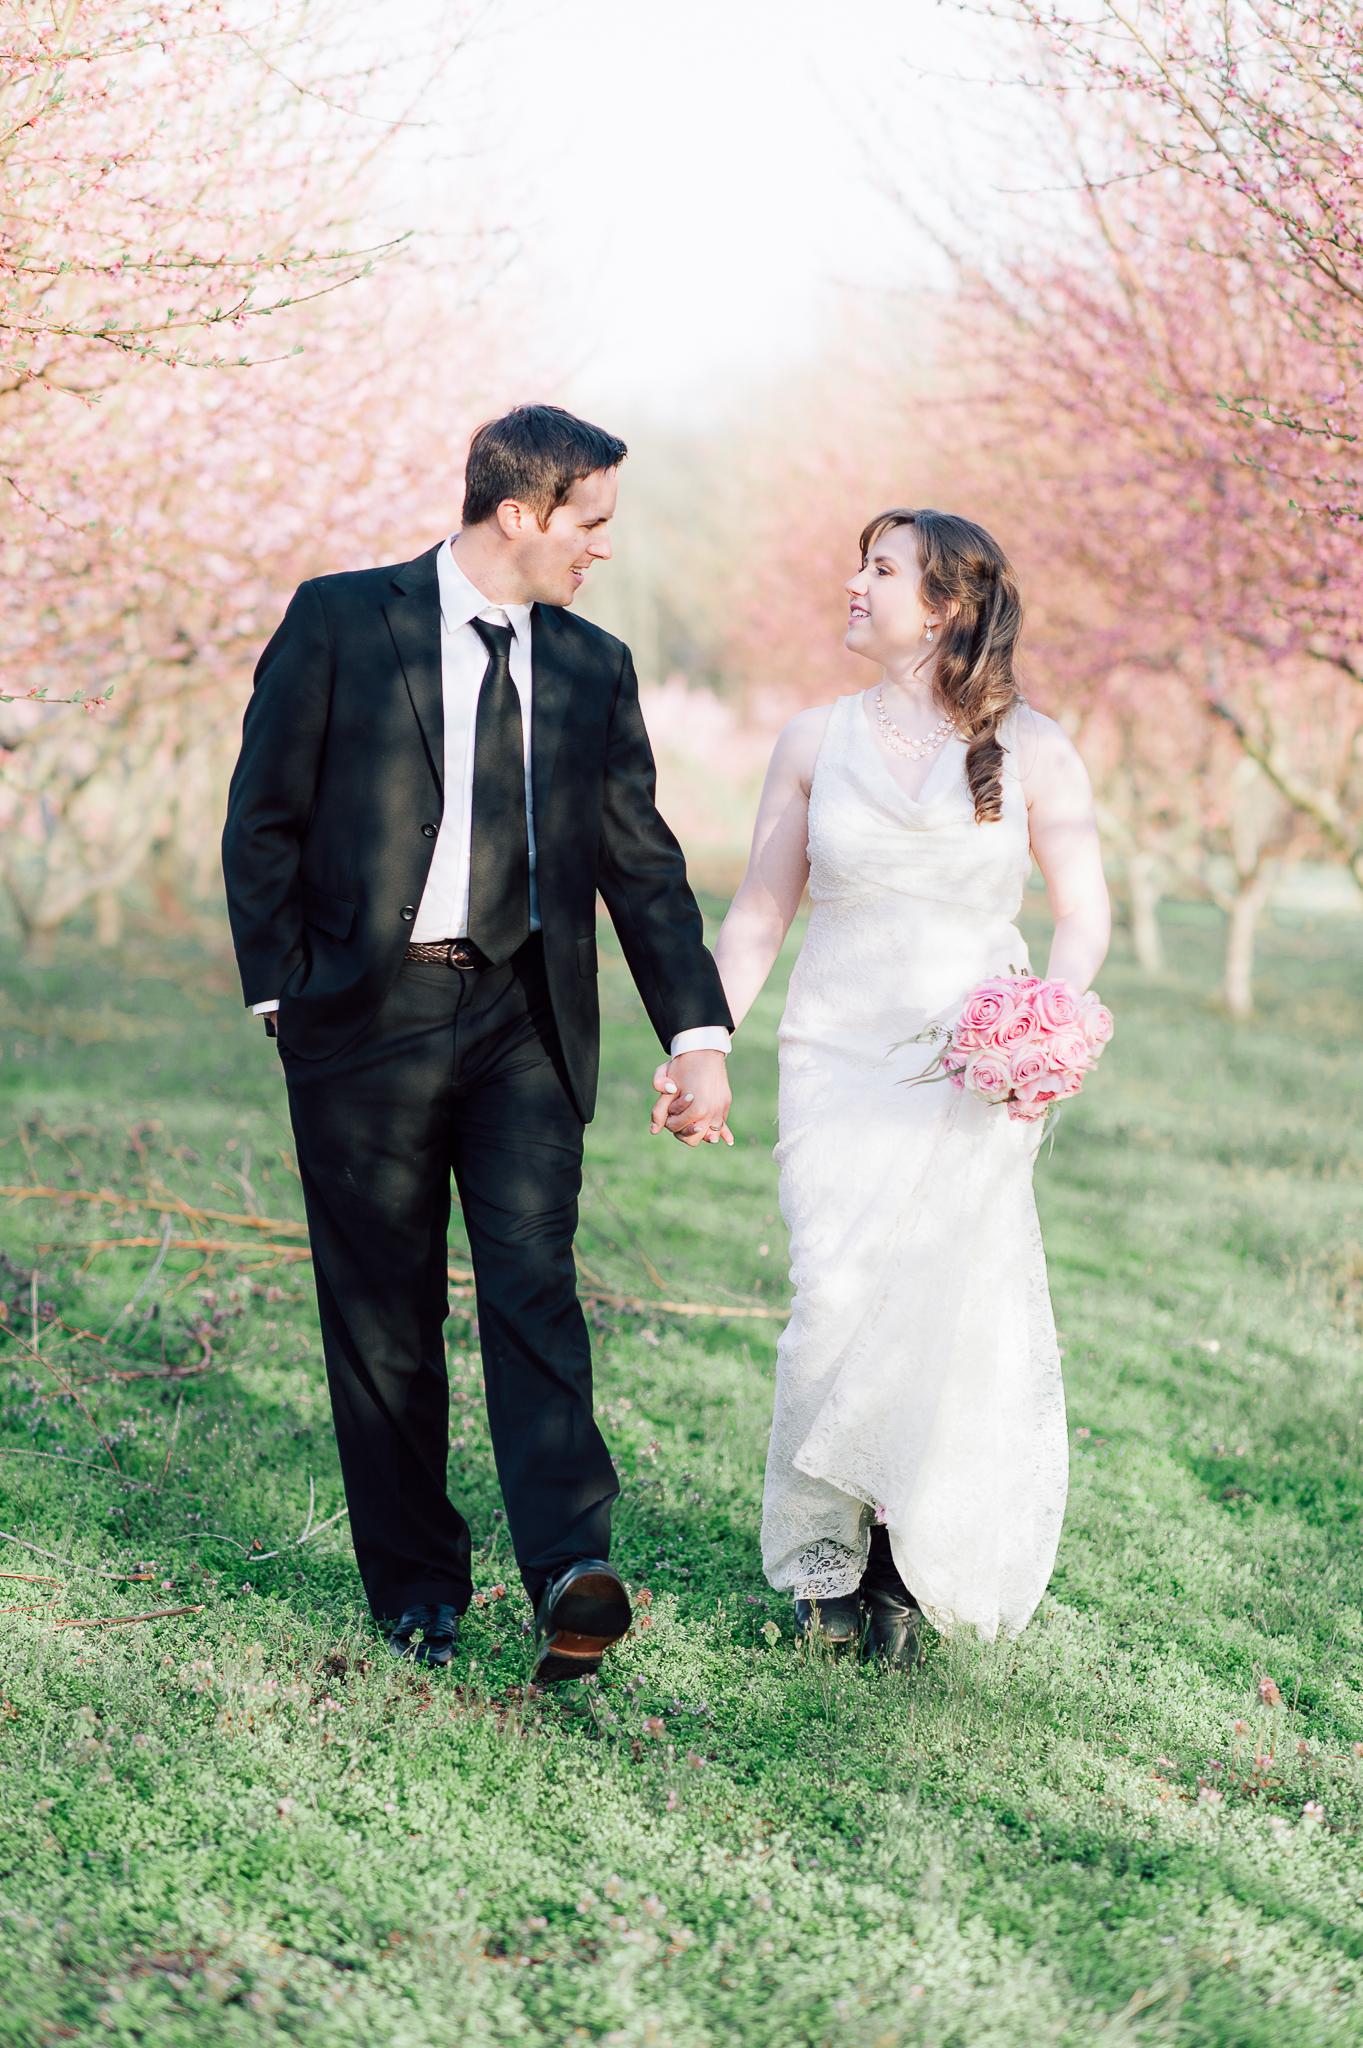 springwedding_cherryblossoms_virginiaphotographer_youseephotography_styledshoot (587).jpg